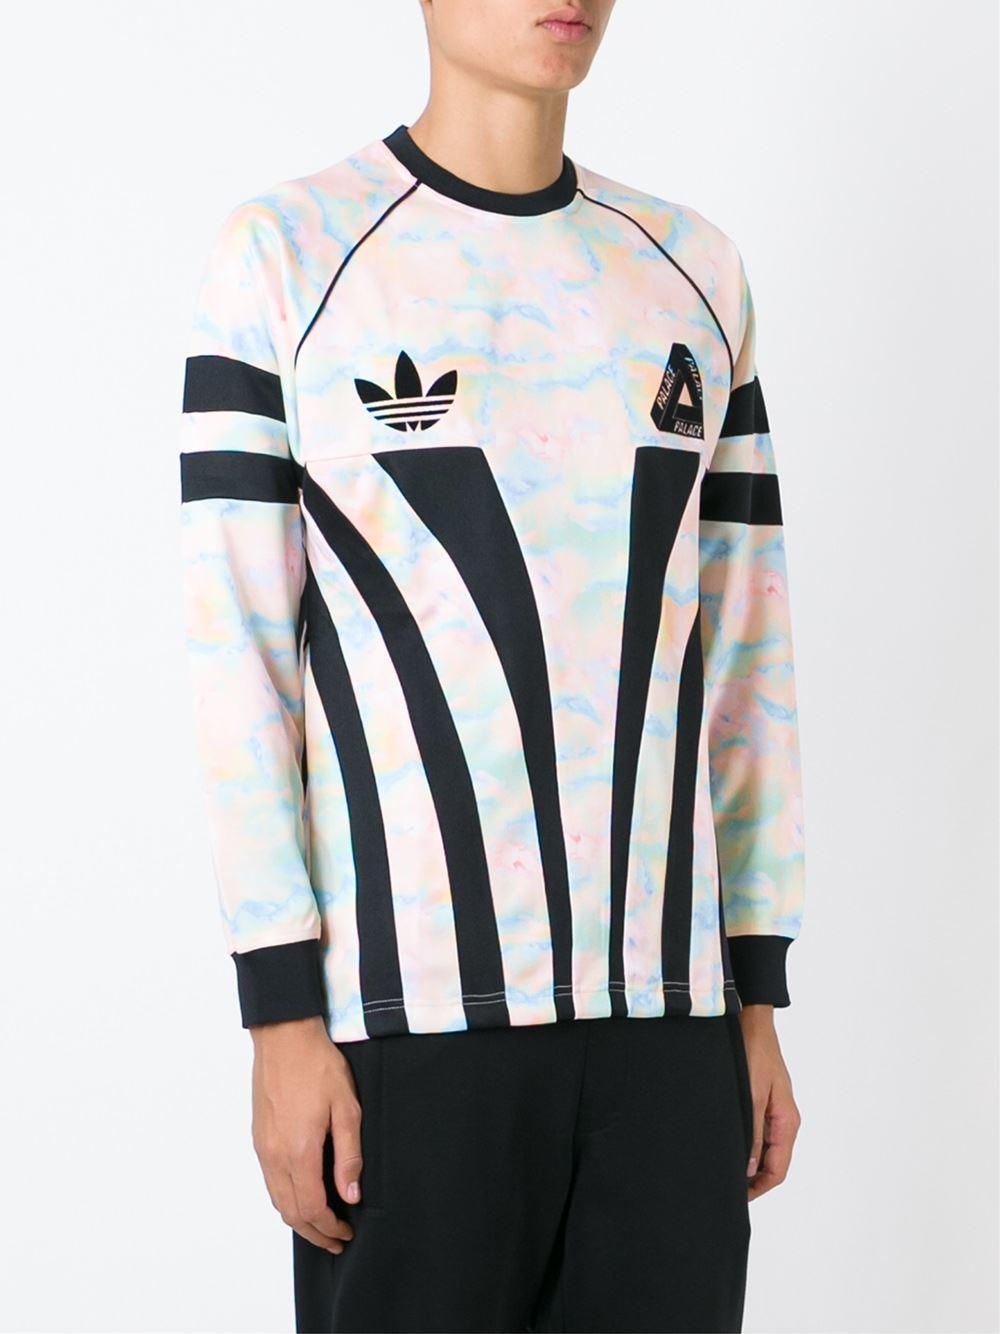 ' X For Lyst Black Originals Palace' Sweatshirt In Men Adidas vw5qERn